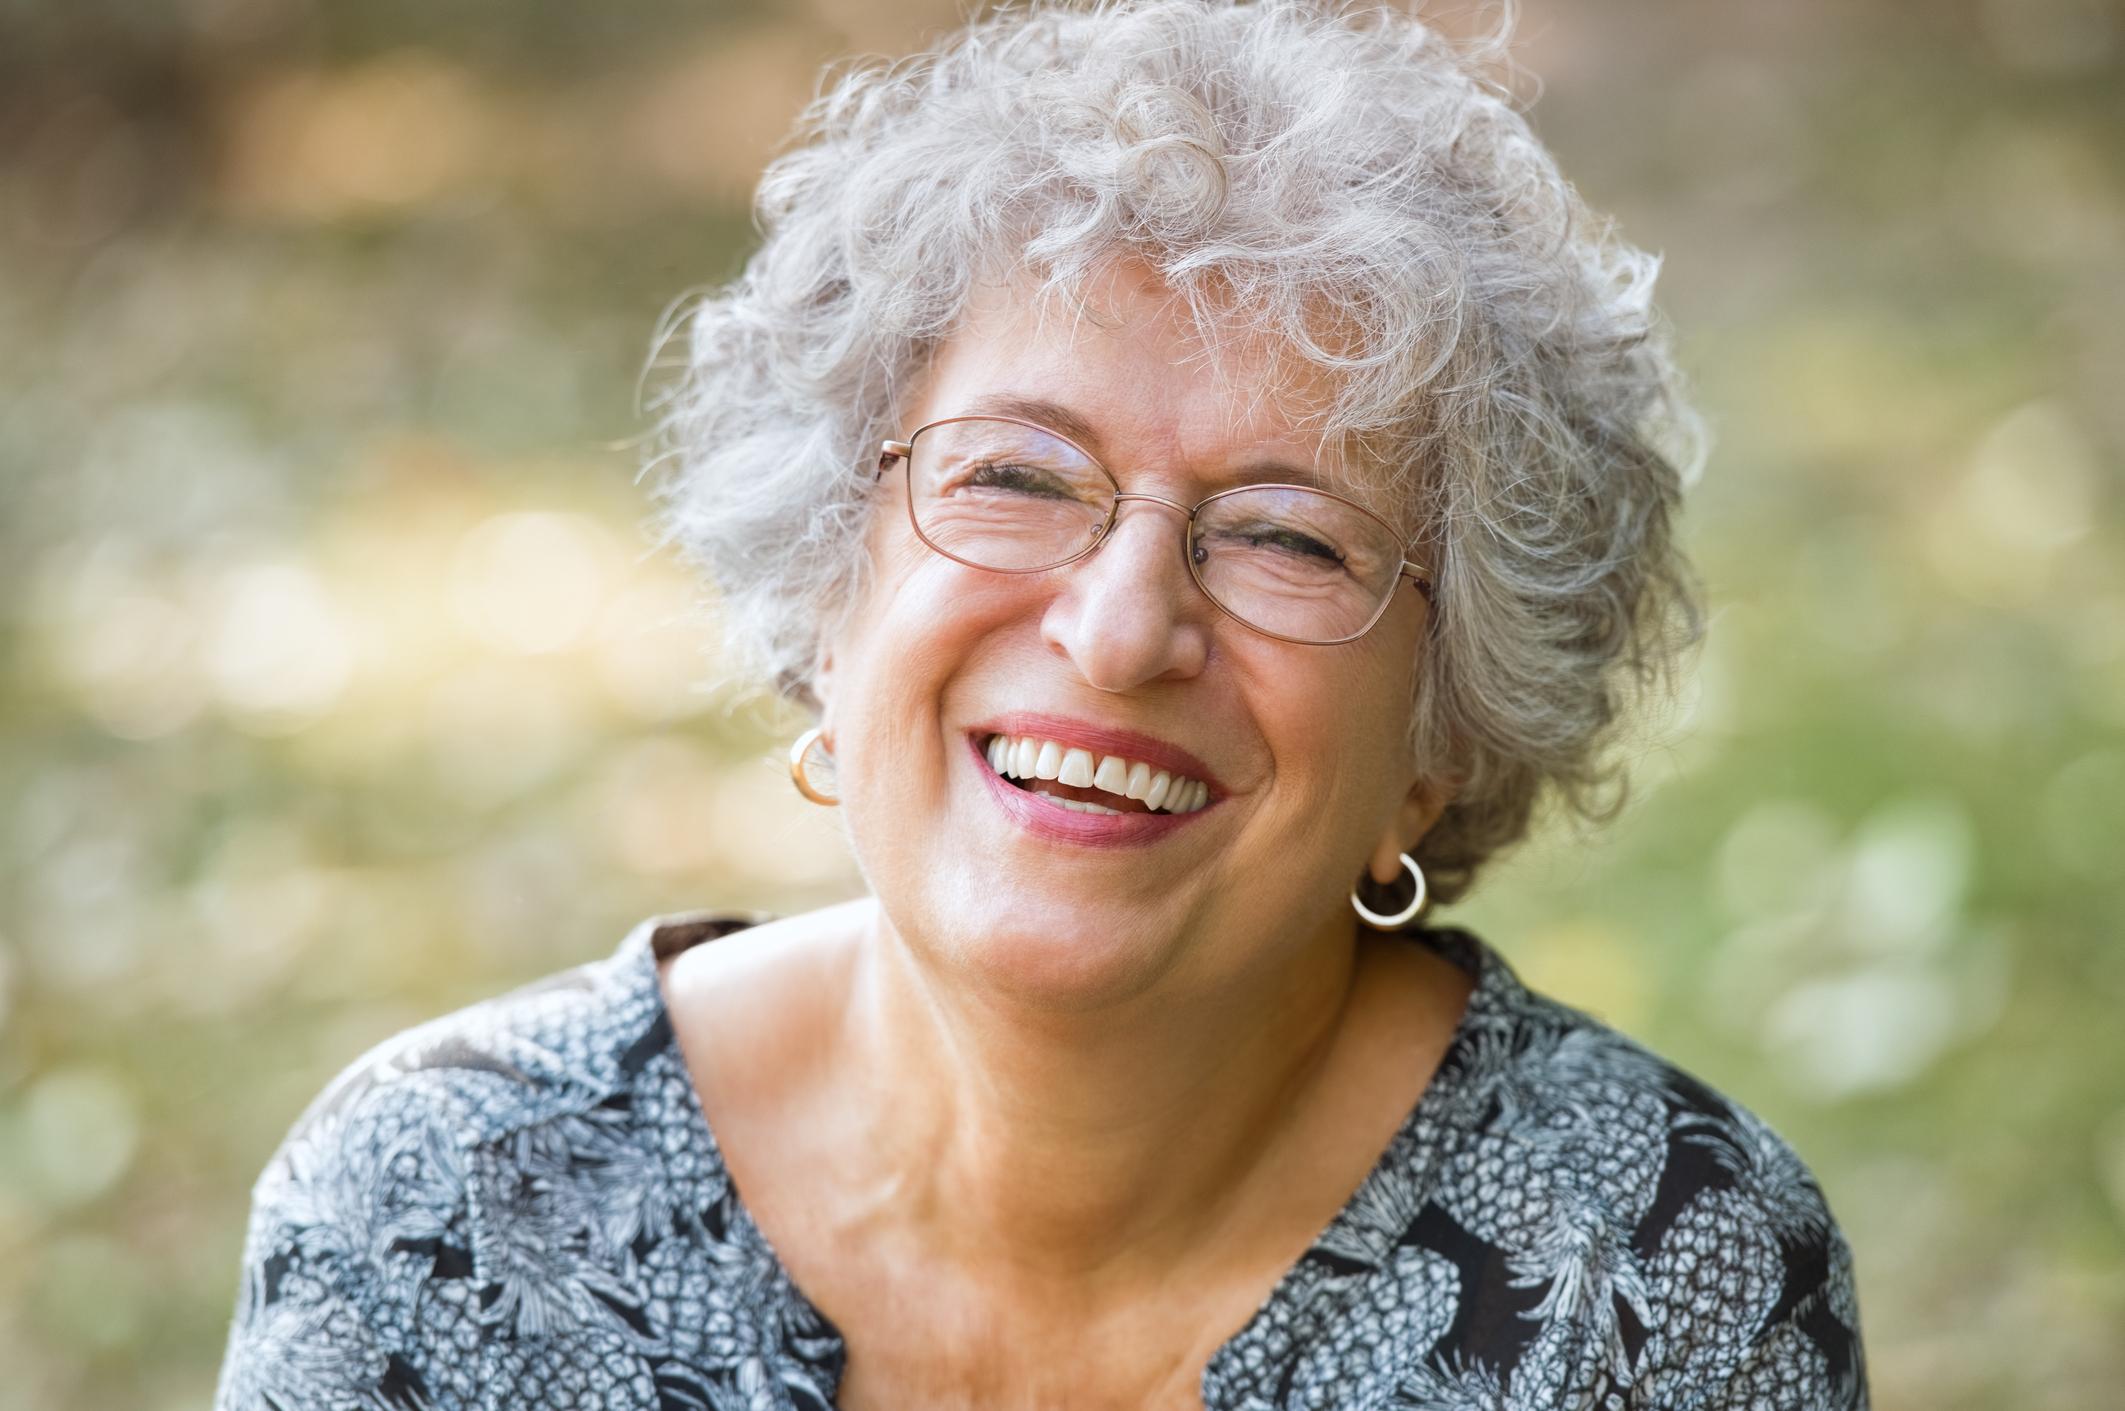 Smiling senior woman wearing glasses